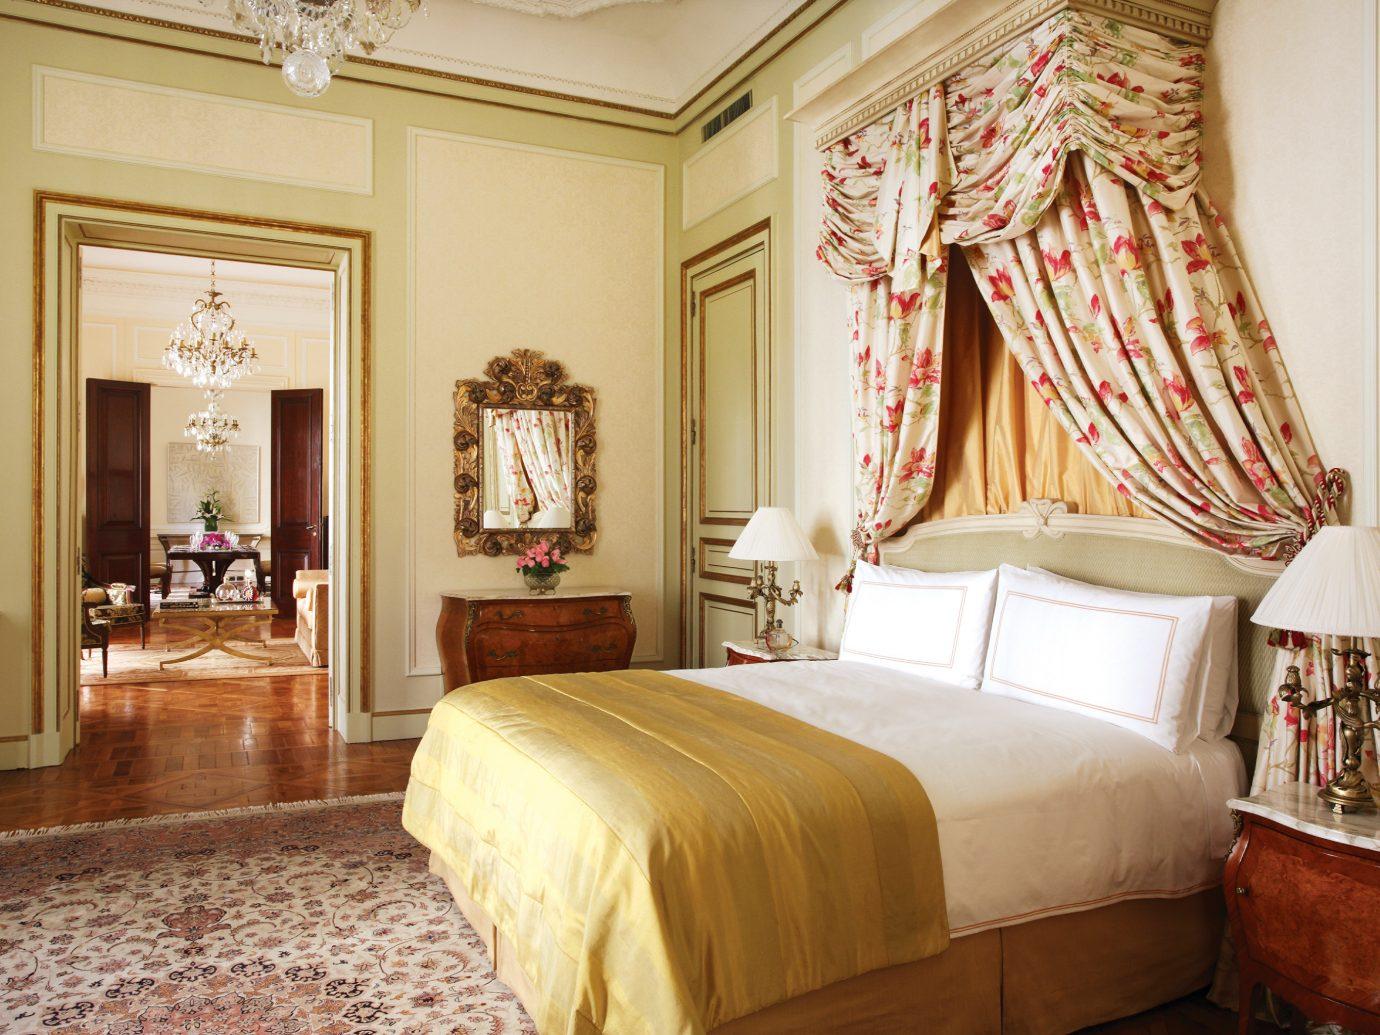 Bedroom Elegant Historic Hotels Romance Style + Design Suite indoor bed wall floor room property interior design estate hotel bed sheet living room real estate decorated